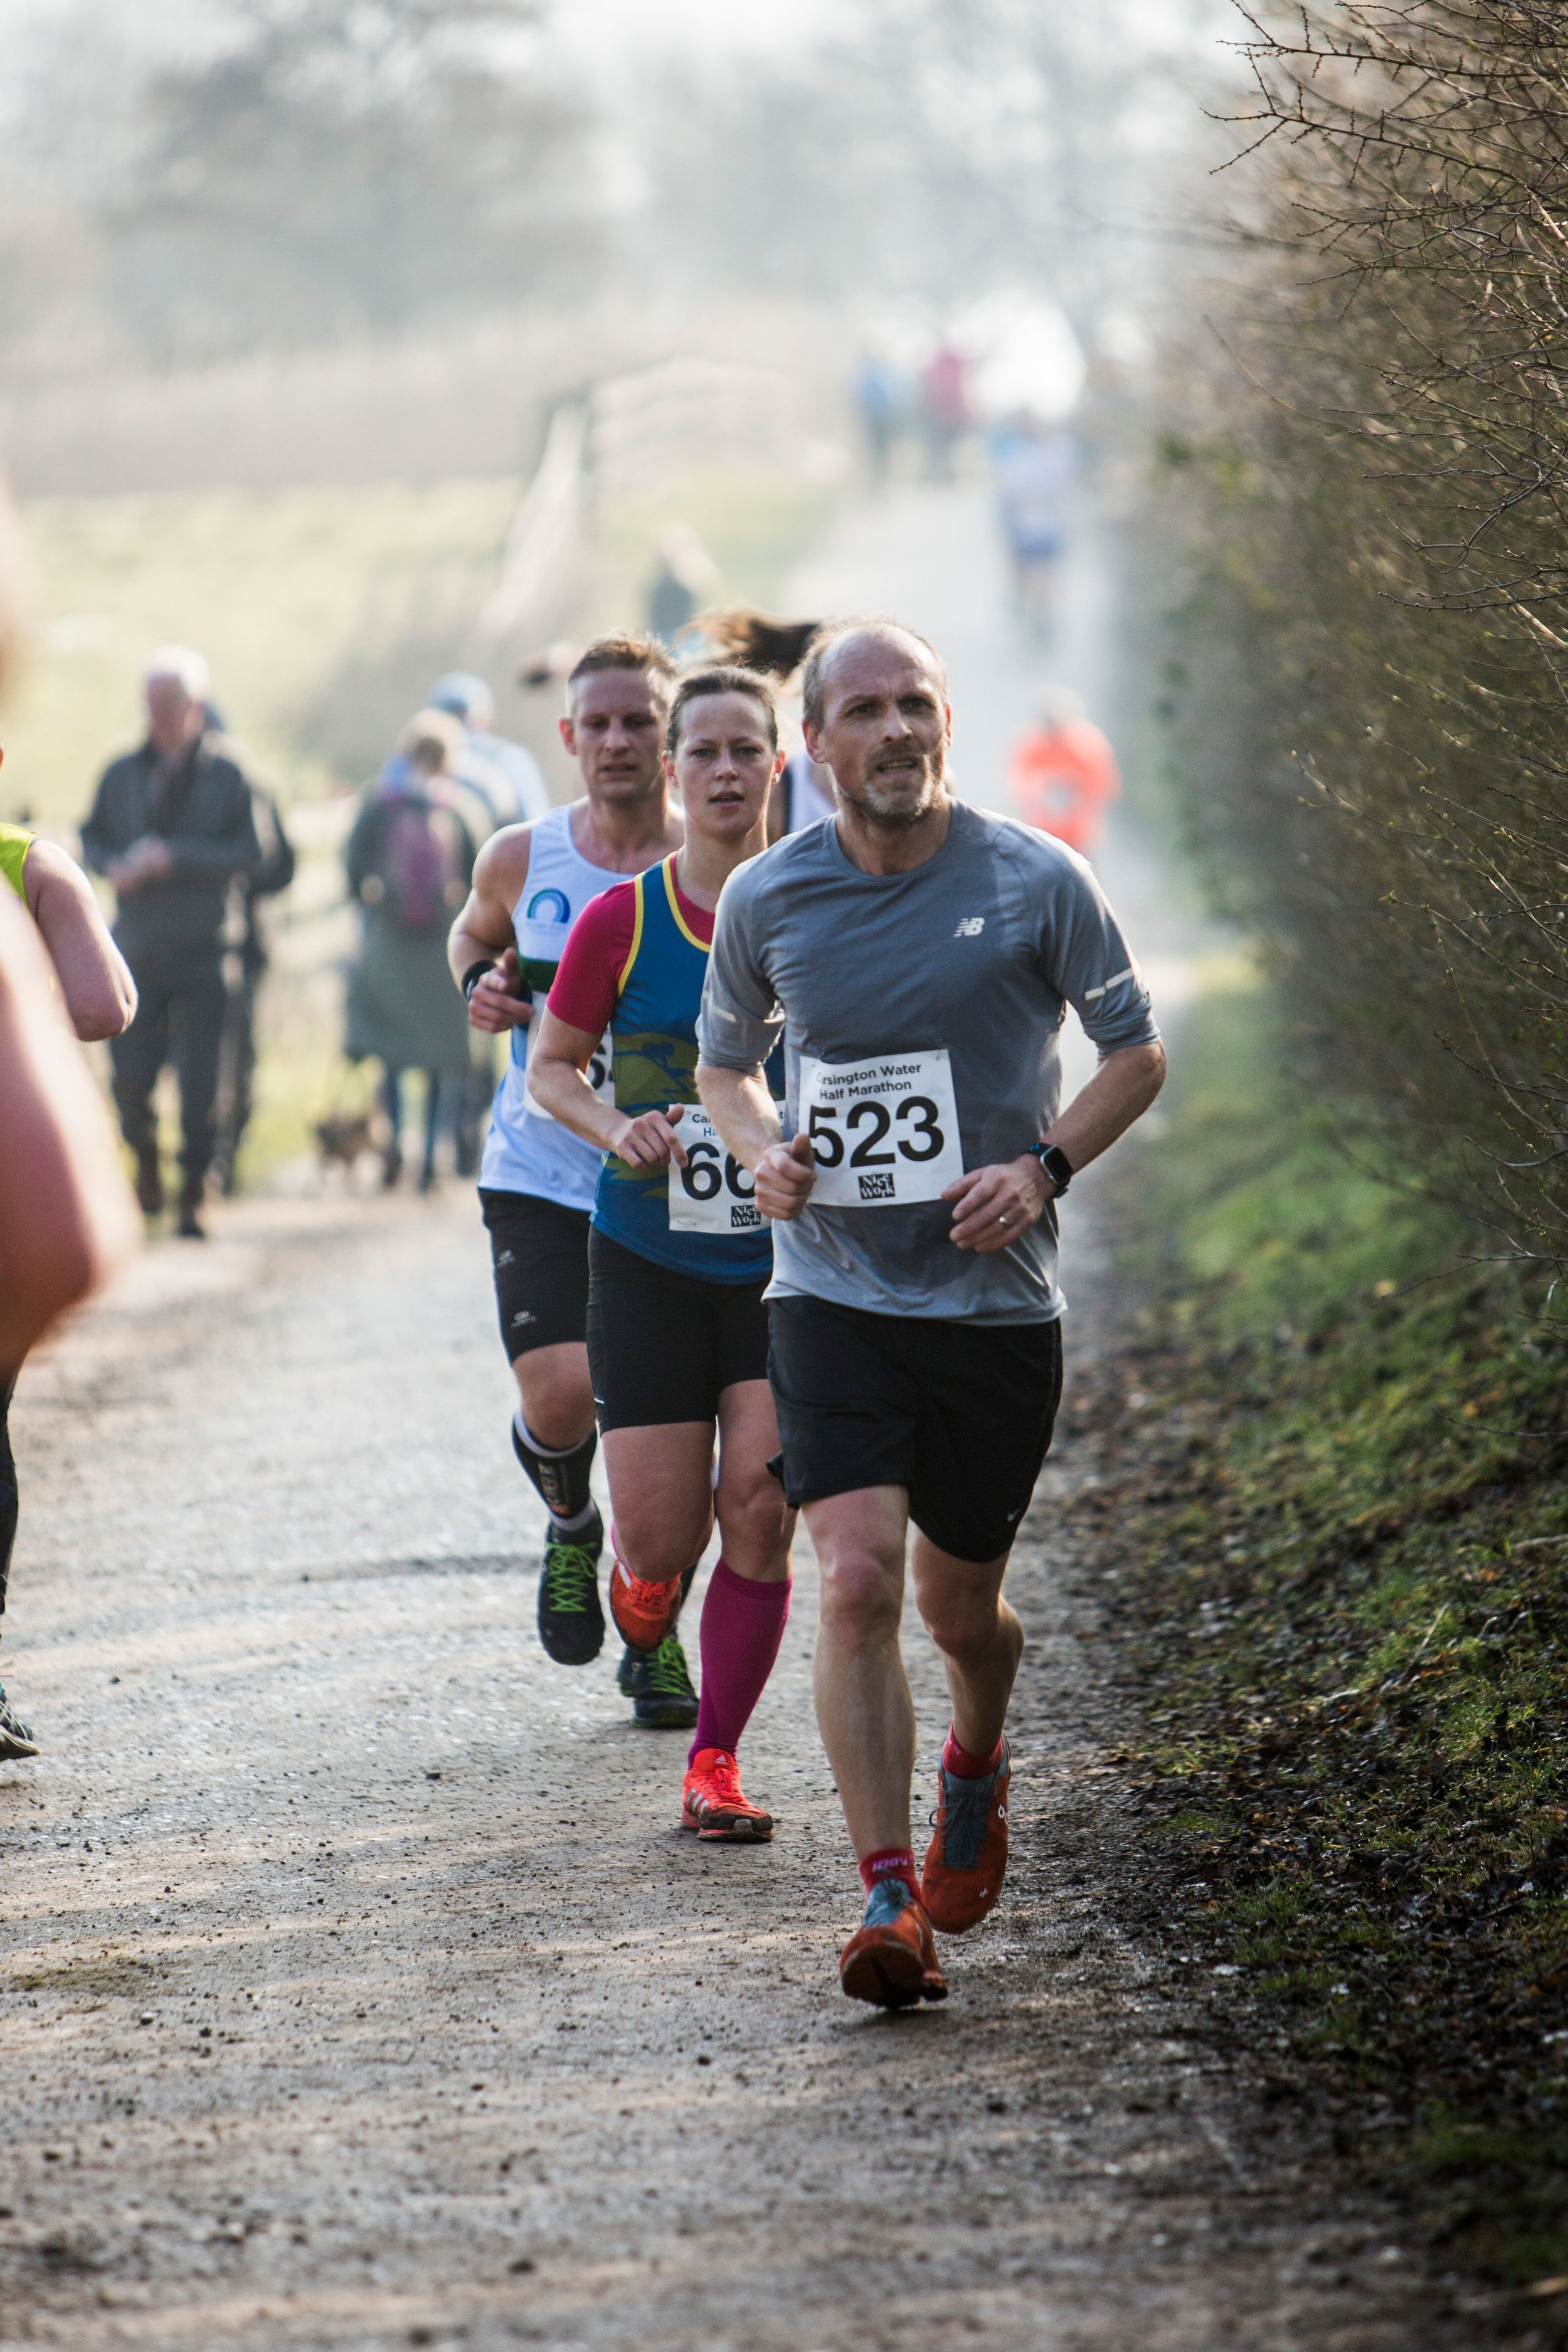 Carsington Half Marathon